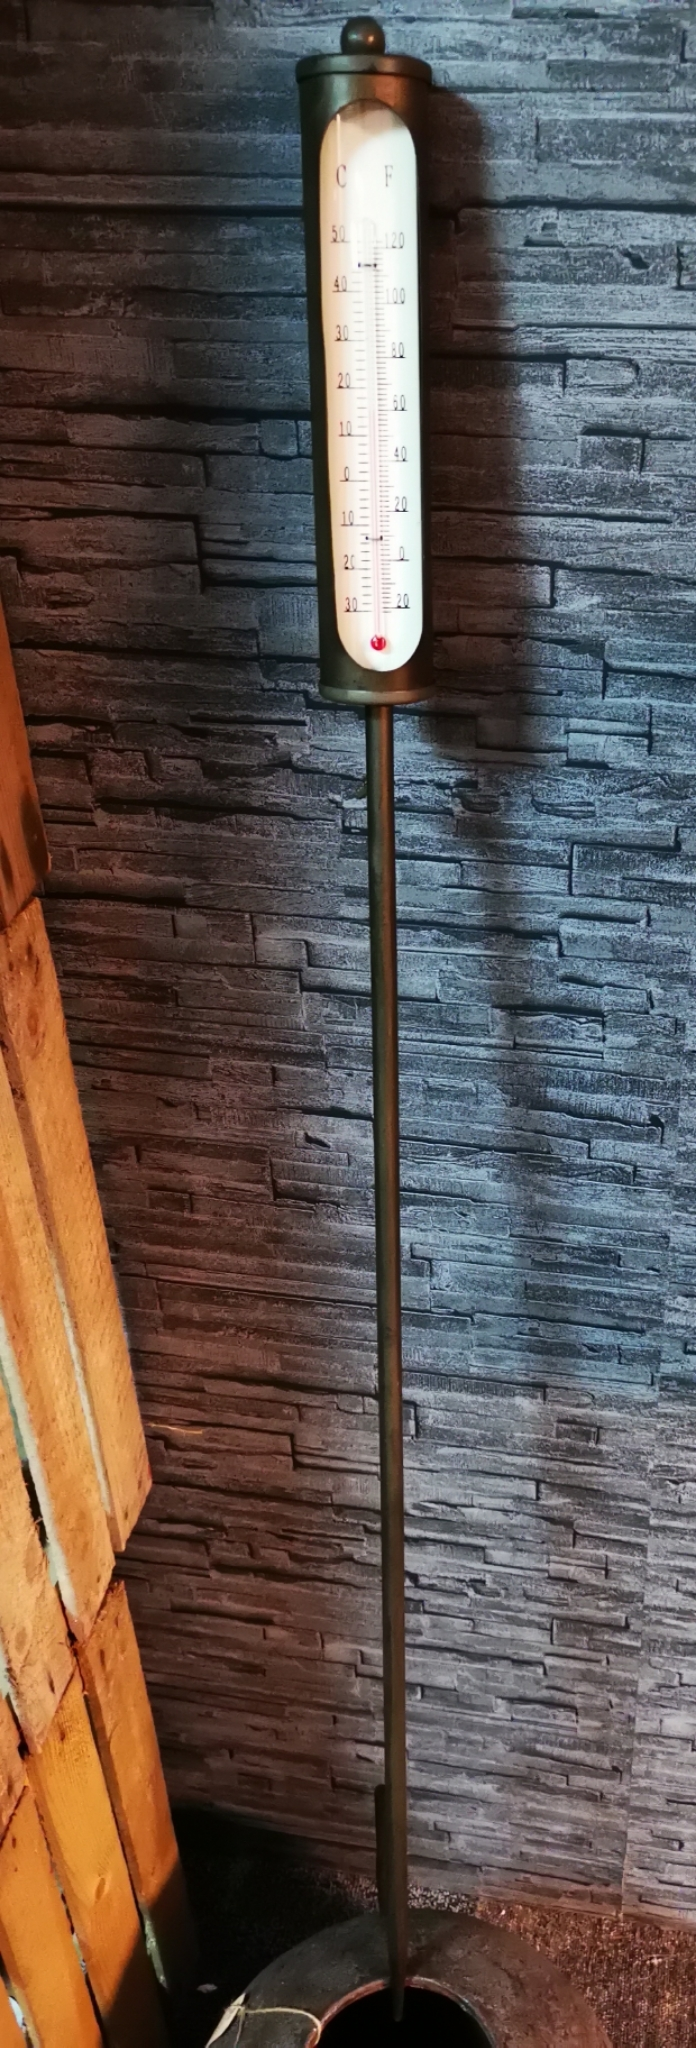 Metalen thermometer op prikker